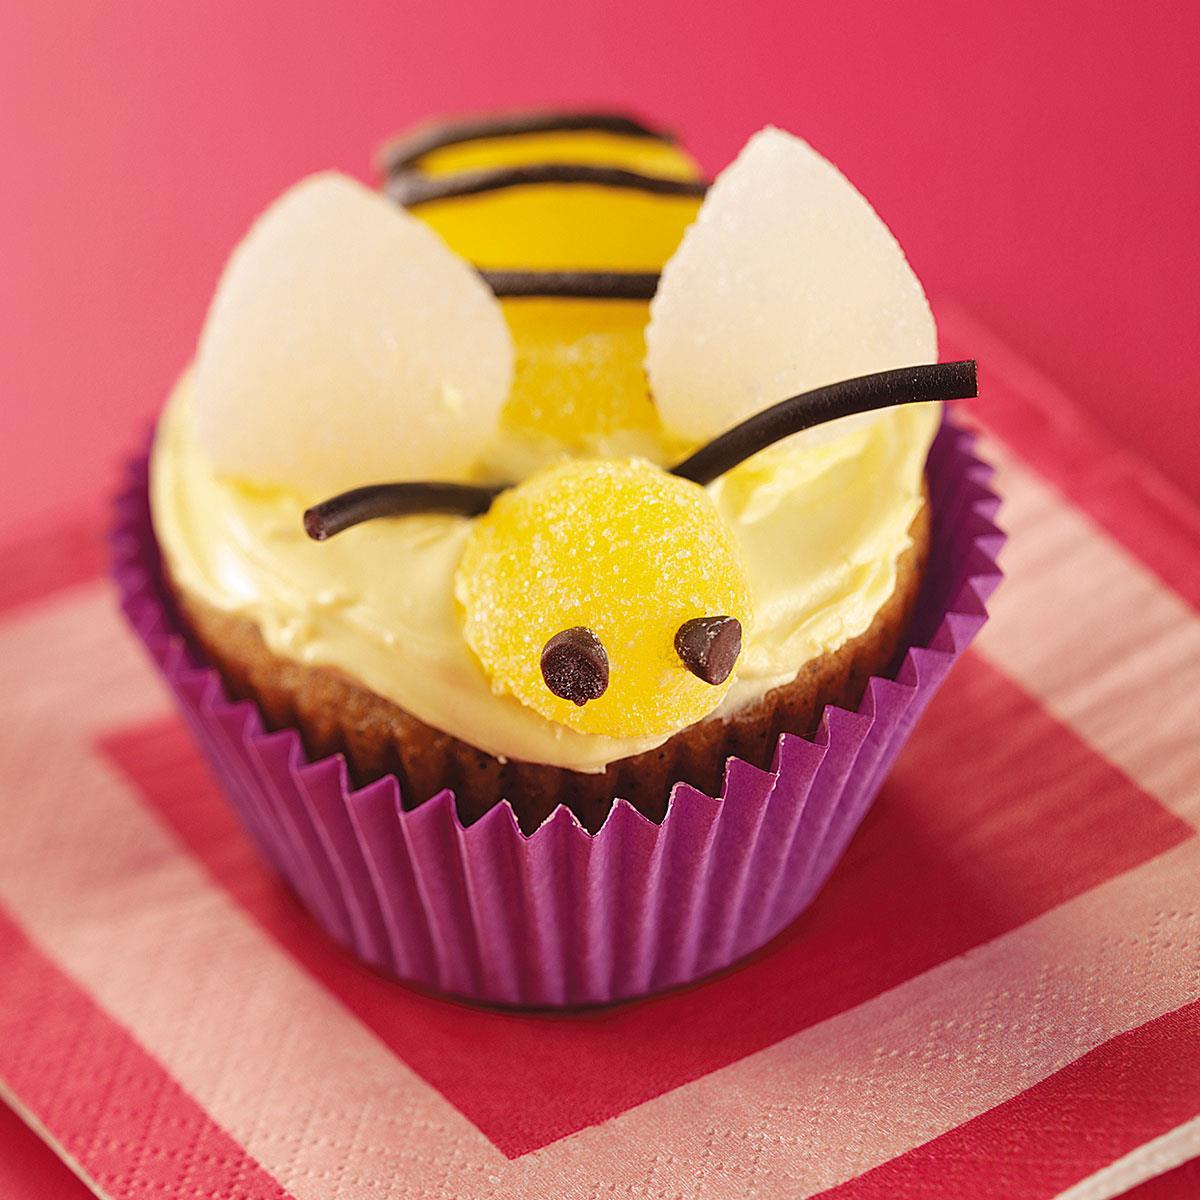 Bumblebee Banana Cupcakes Recipe Taste of Home